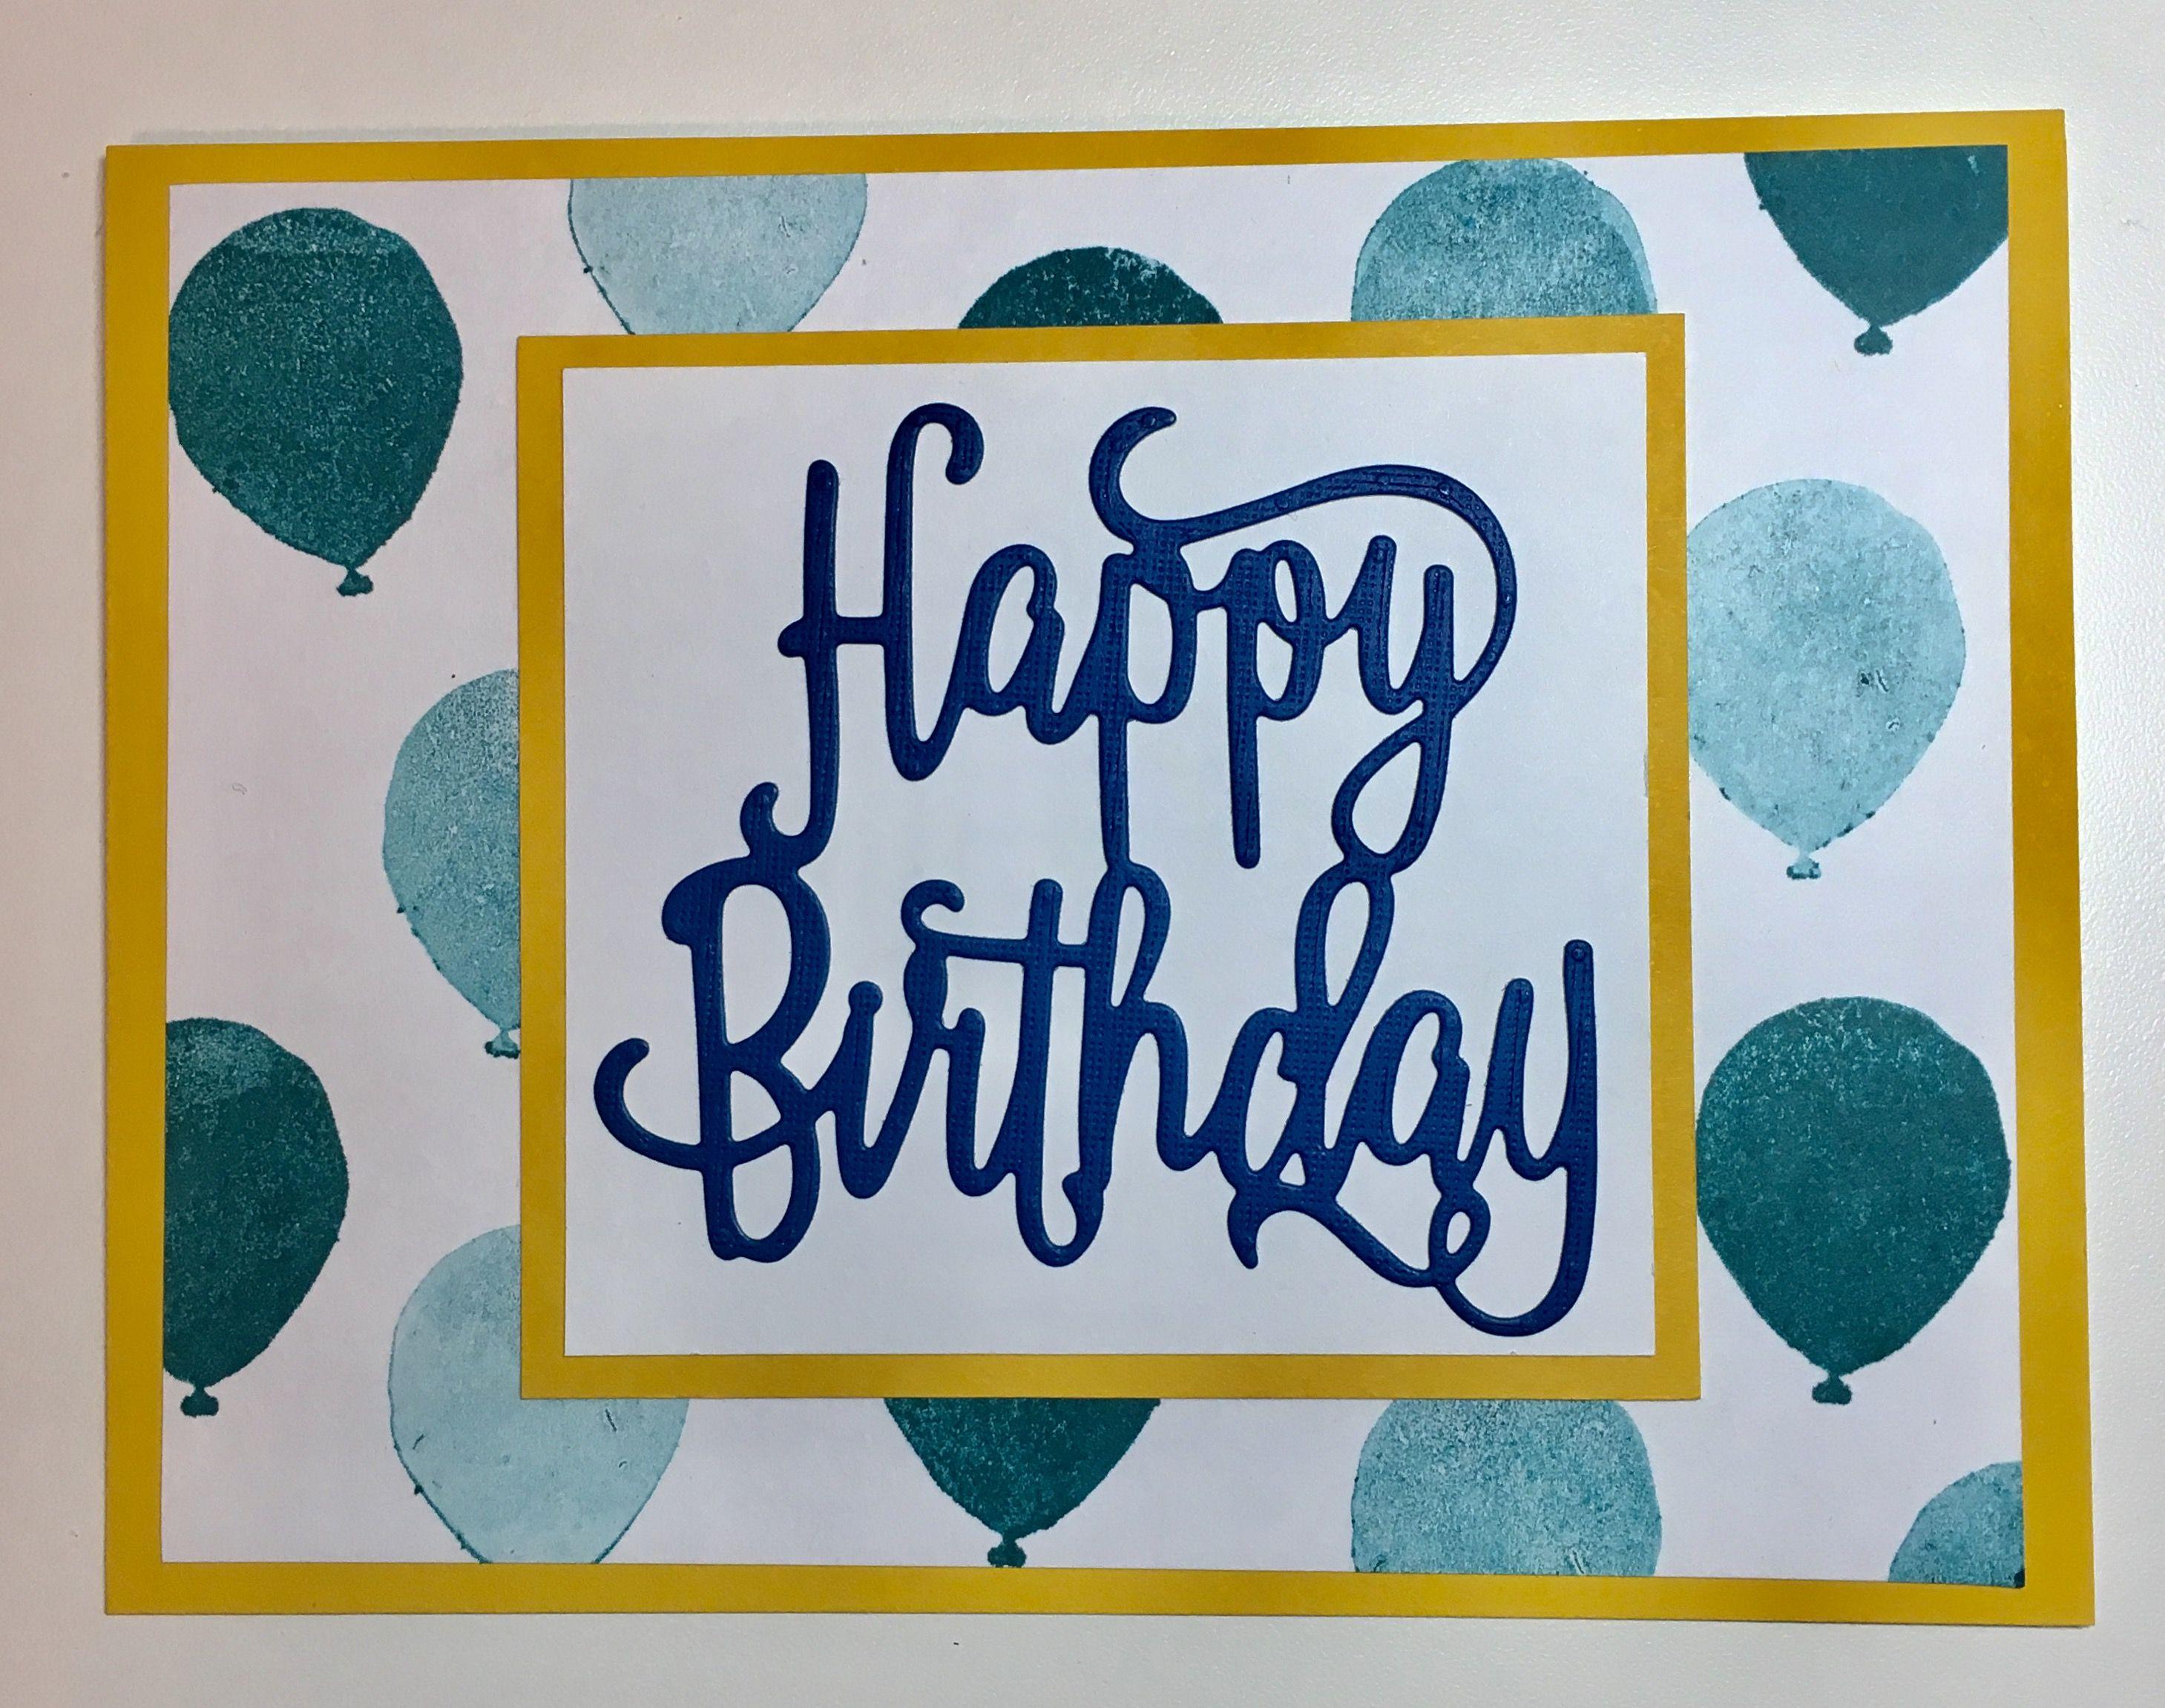 Guy birthday card my cards pinterest guy birthday guy birthday card bookmarktalkfo Gallery